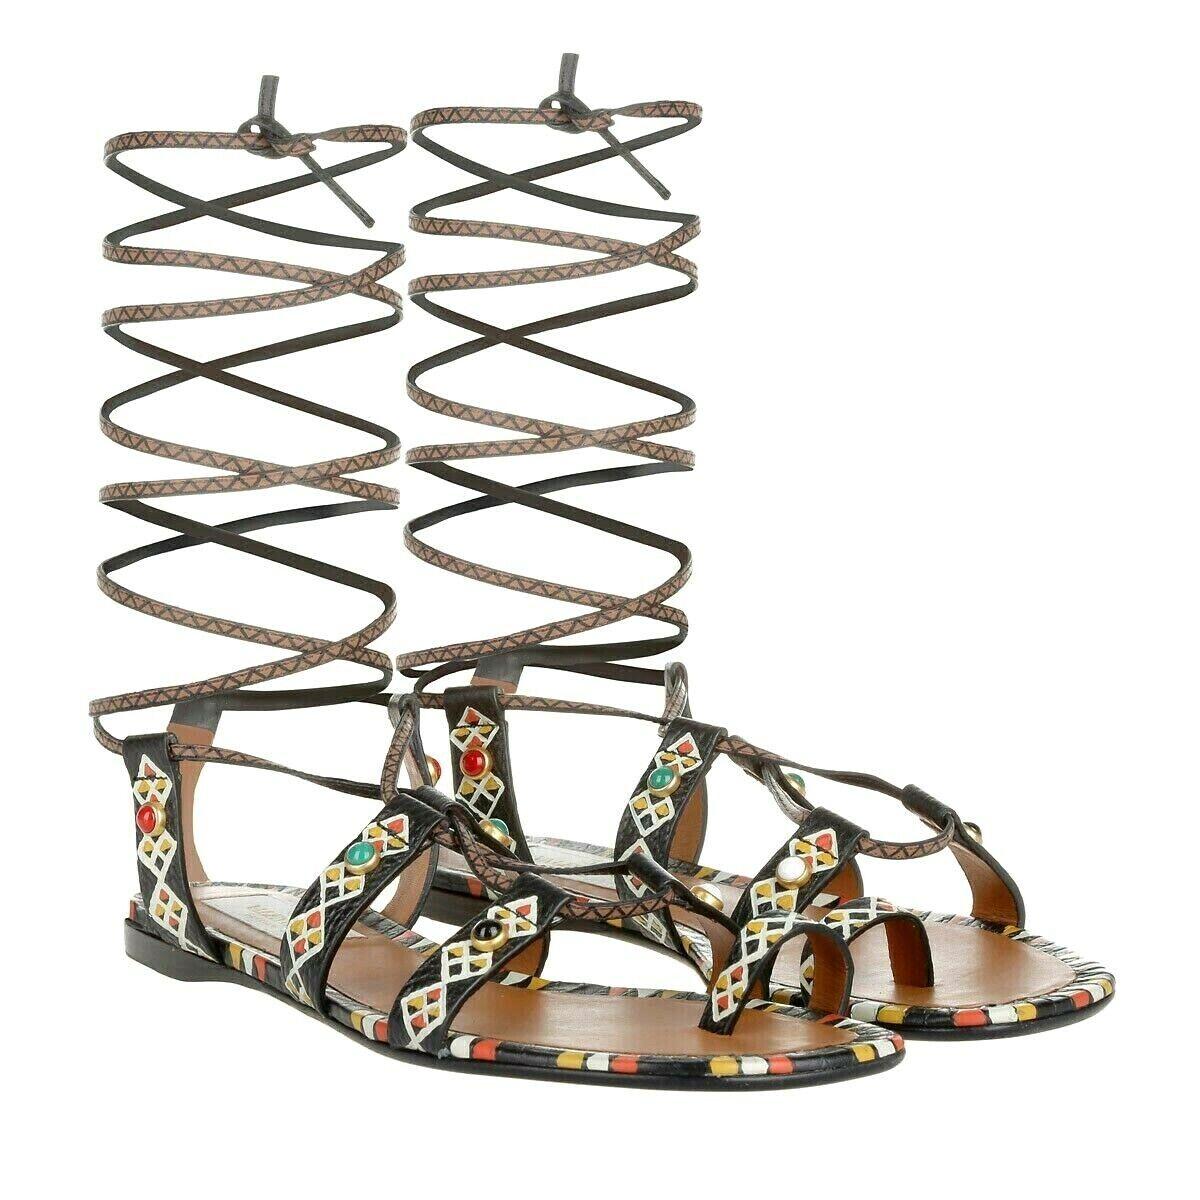 1150 VALENTINO GARAVANI Hand-Painted AFRICAN TRIBAL Gladiator Sandal Sandal Sandal EU37 US-7 a5f496